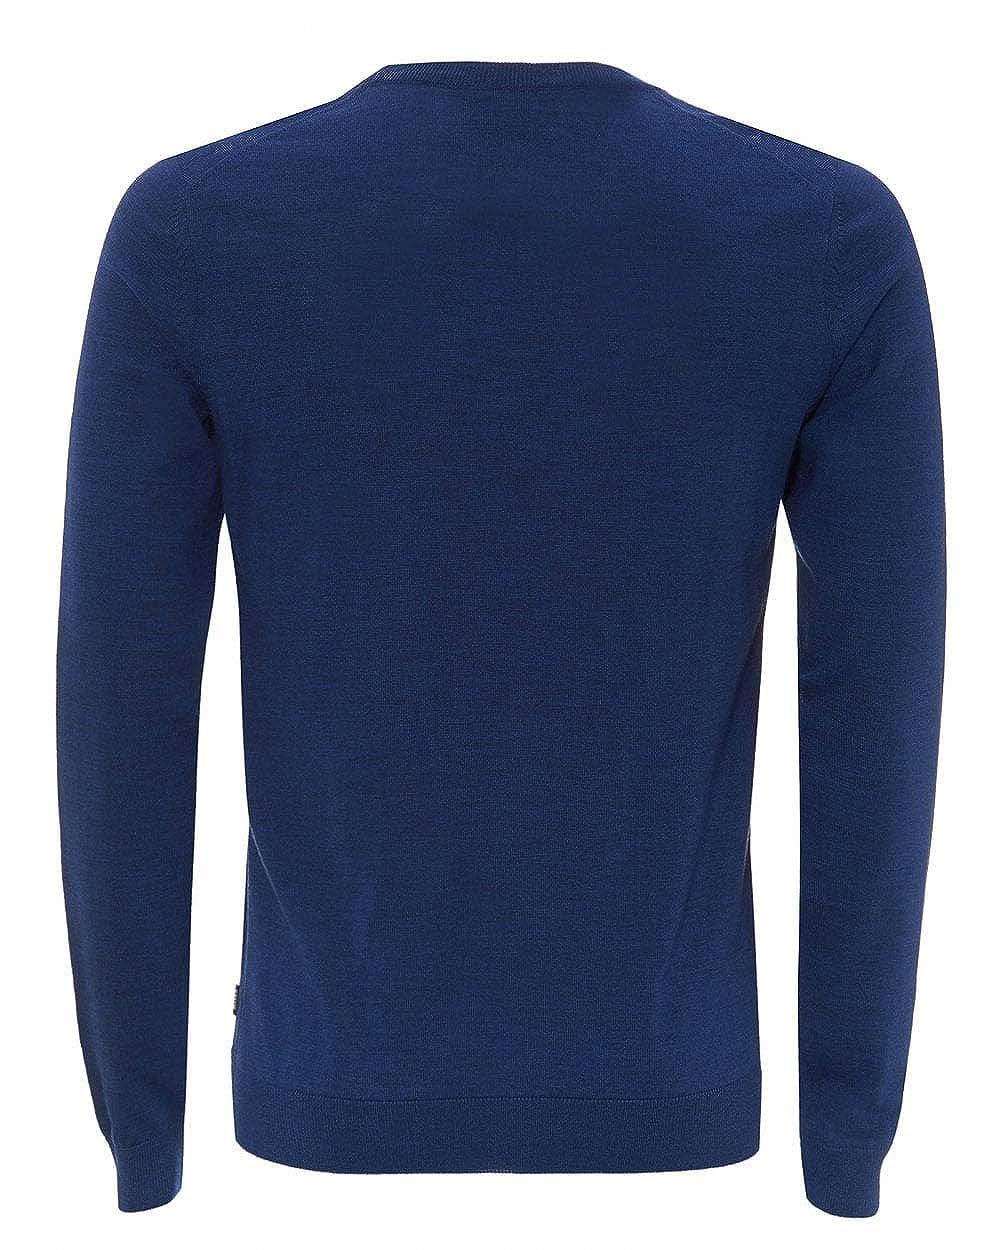 BOSS Langarm Pullover Melba-P V-Ausschnitt Slim Slim Slim Fit Rauchblau B07N3T8V4B Pullover Neueste Technologie d44c85